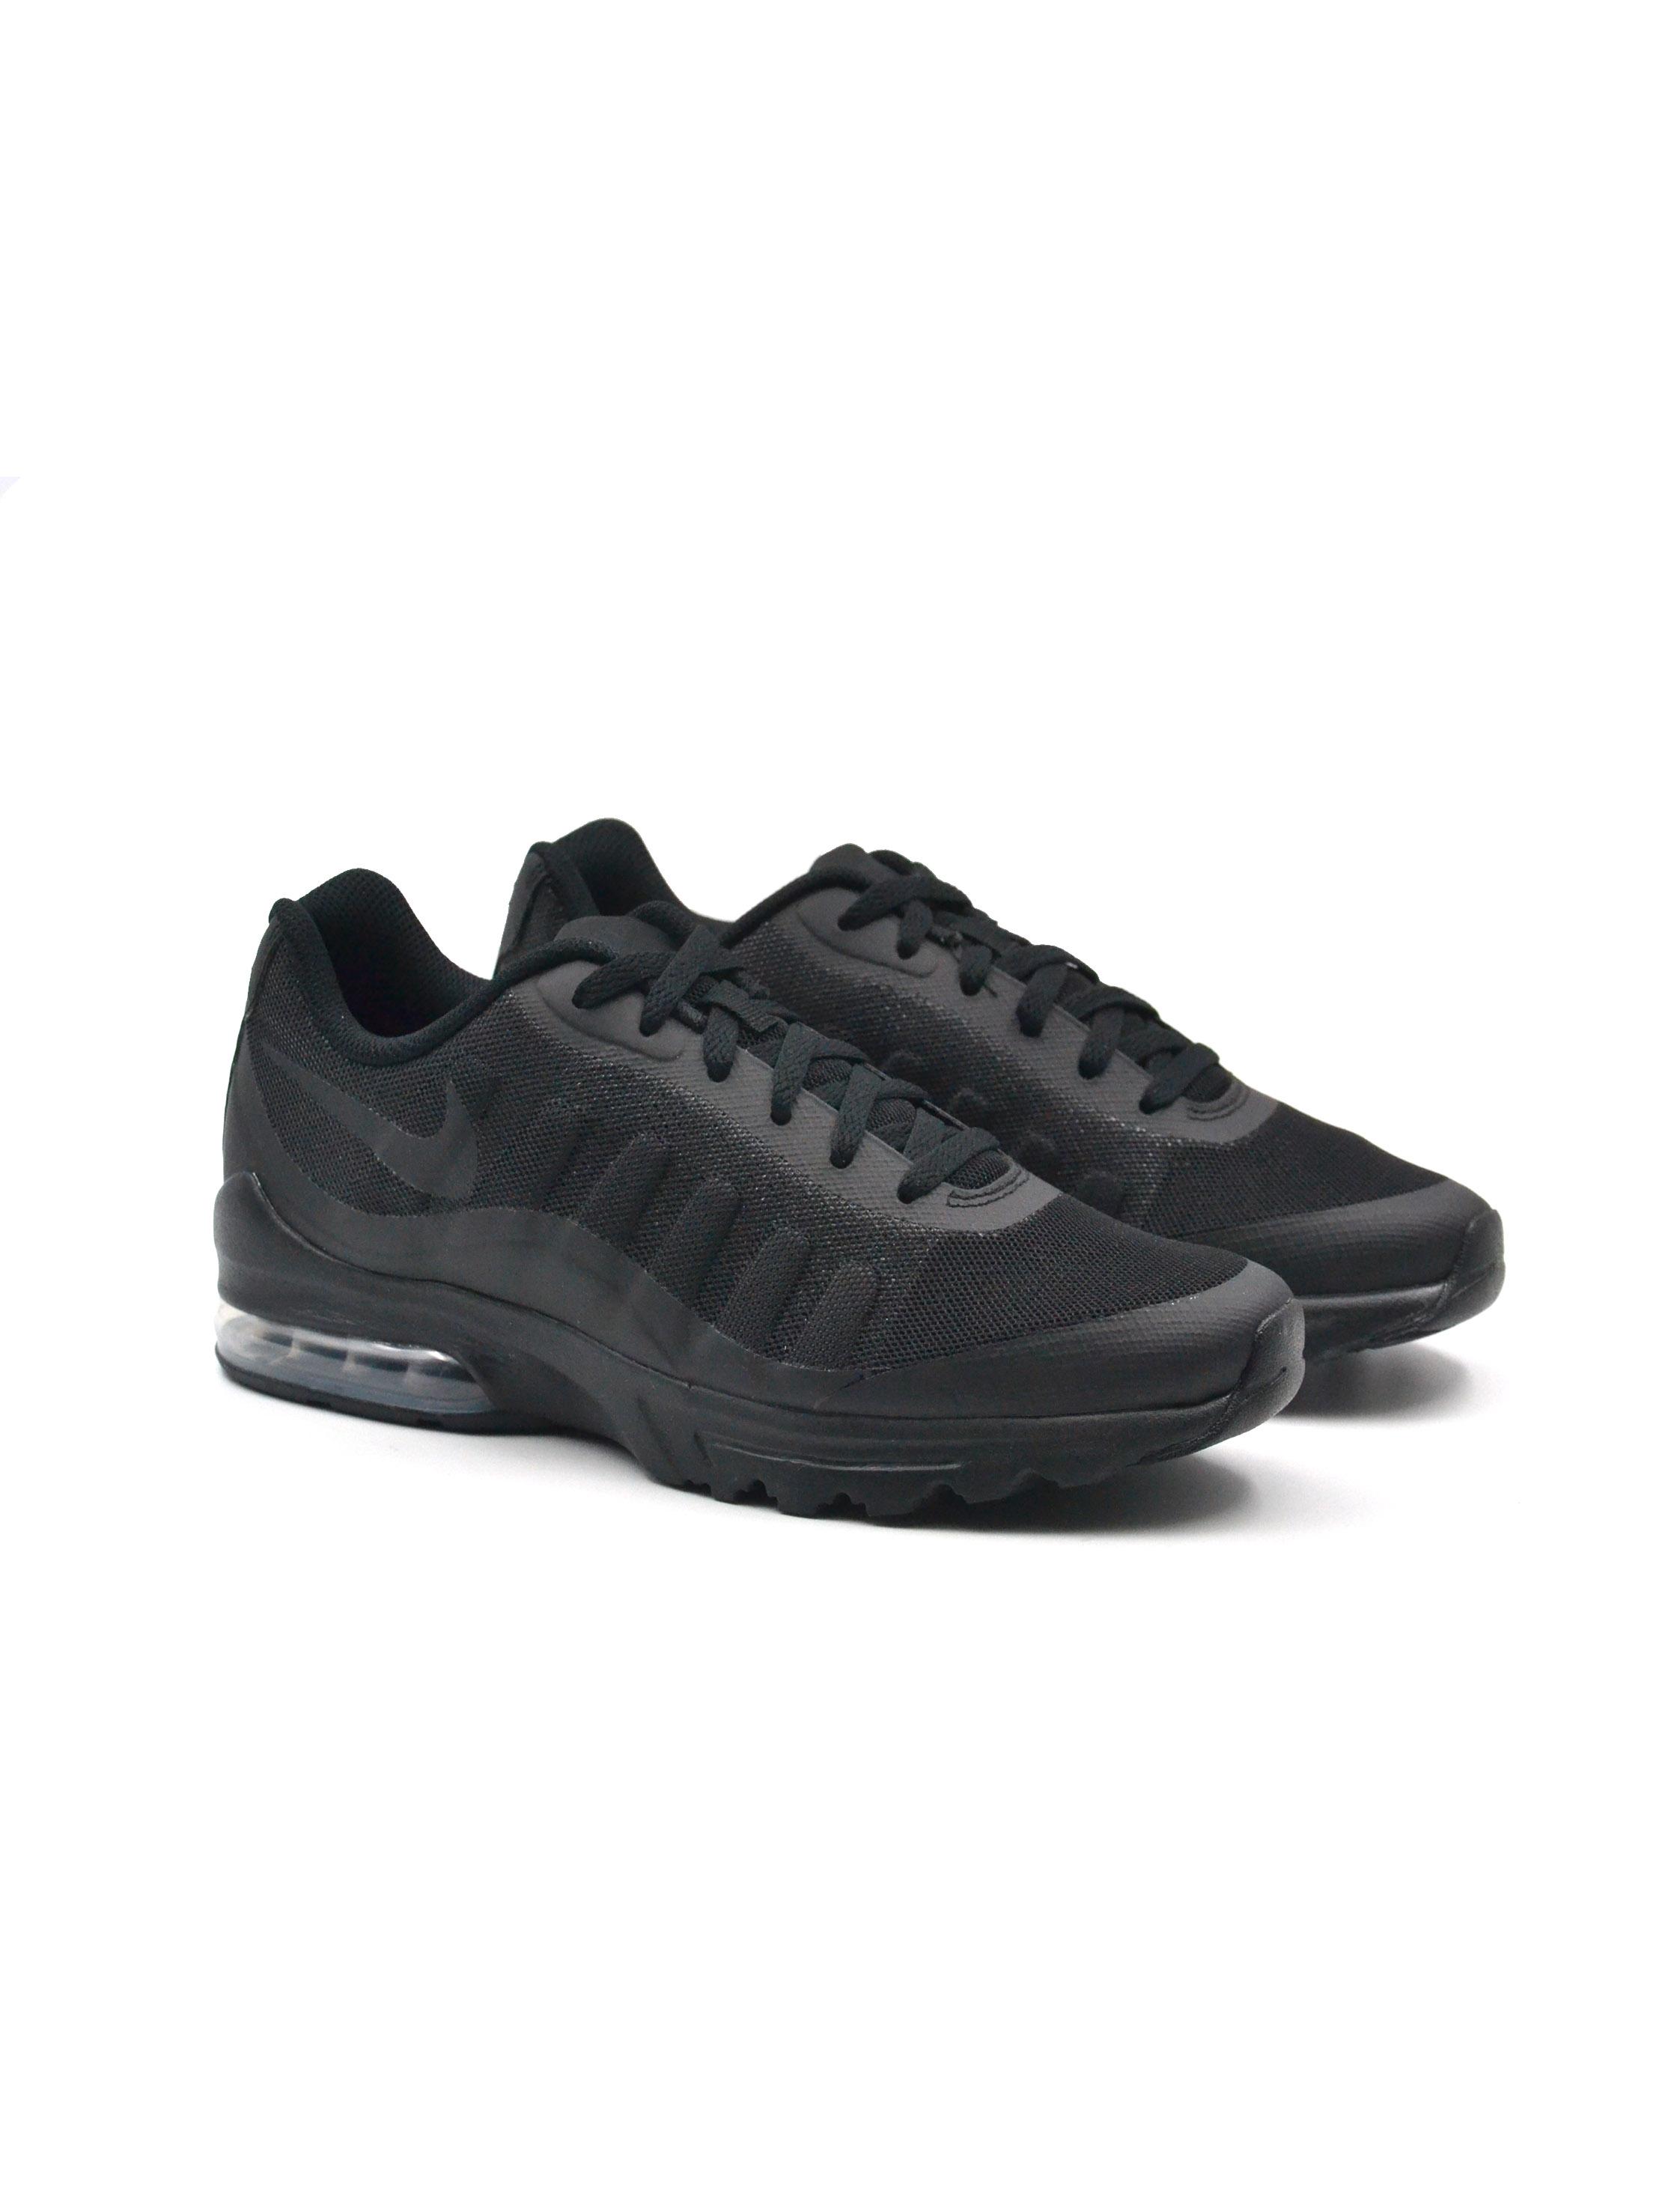 Nike air max invigor sneaker uomo, Sneakers brand, colore